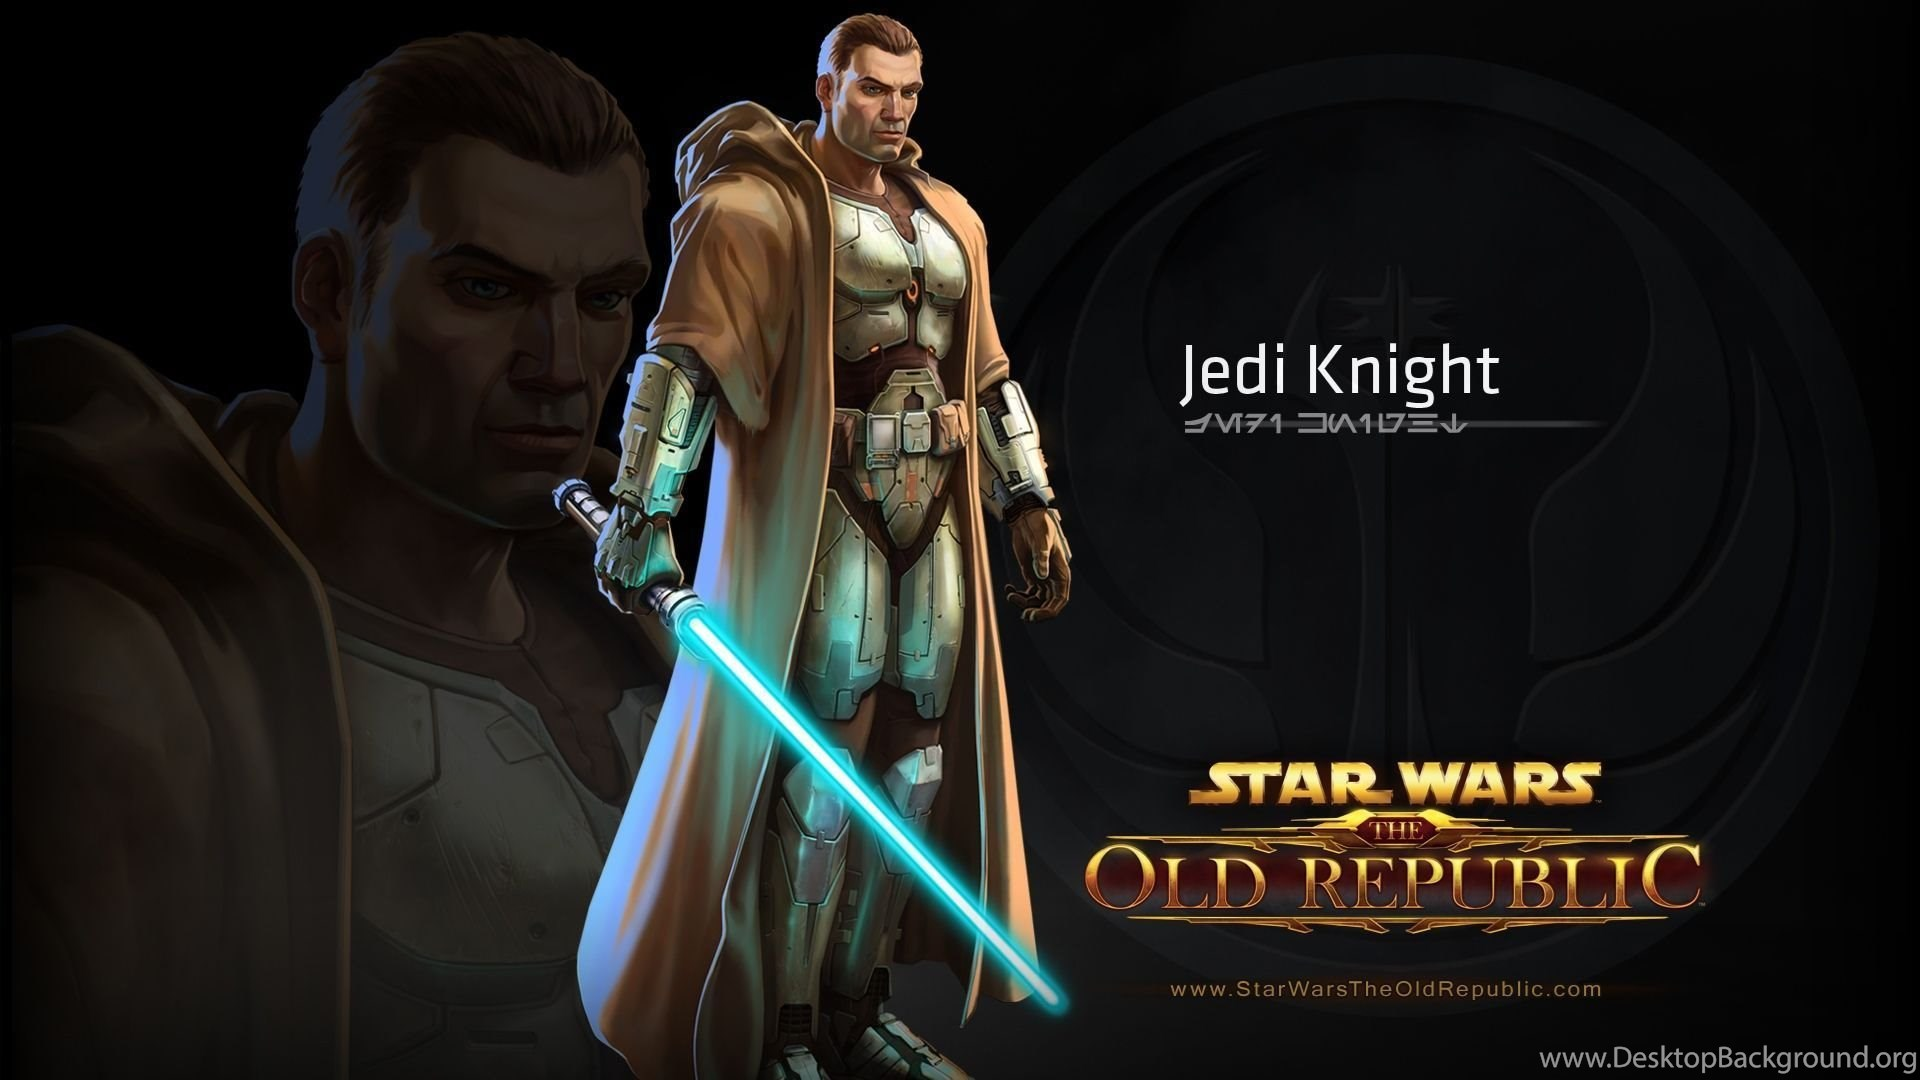 Full Hd 1080p Star Wars The Old Republic Wallpapers Hd Desktop